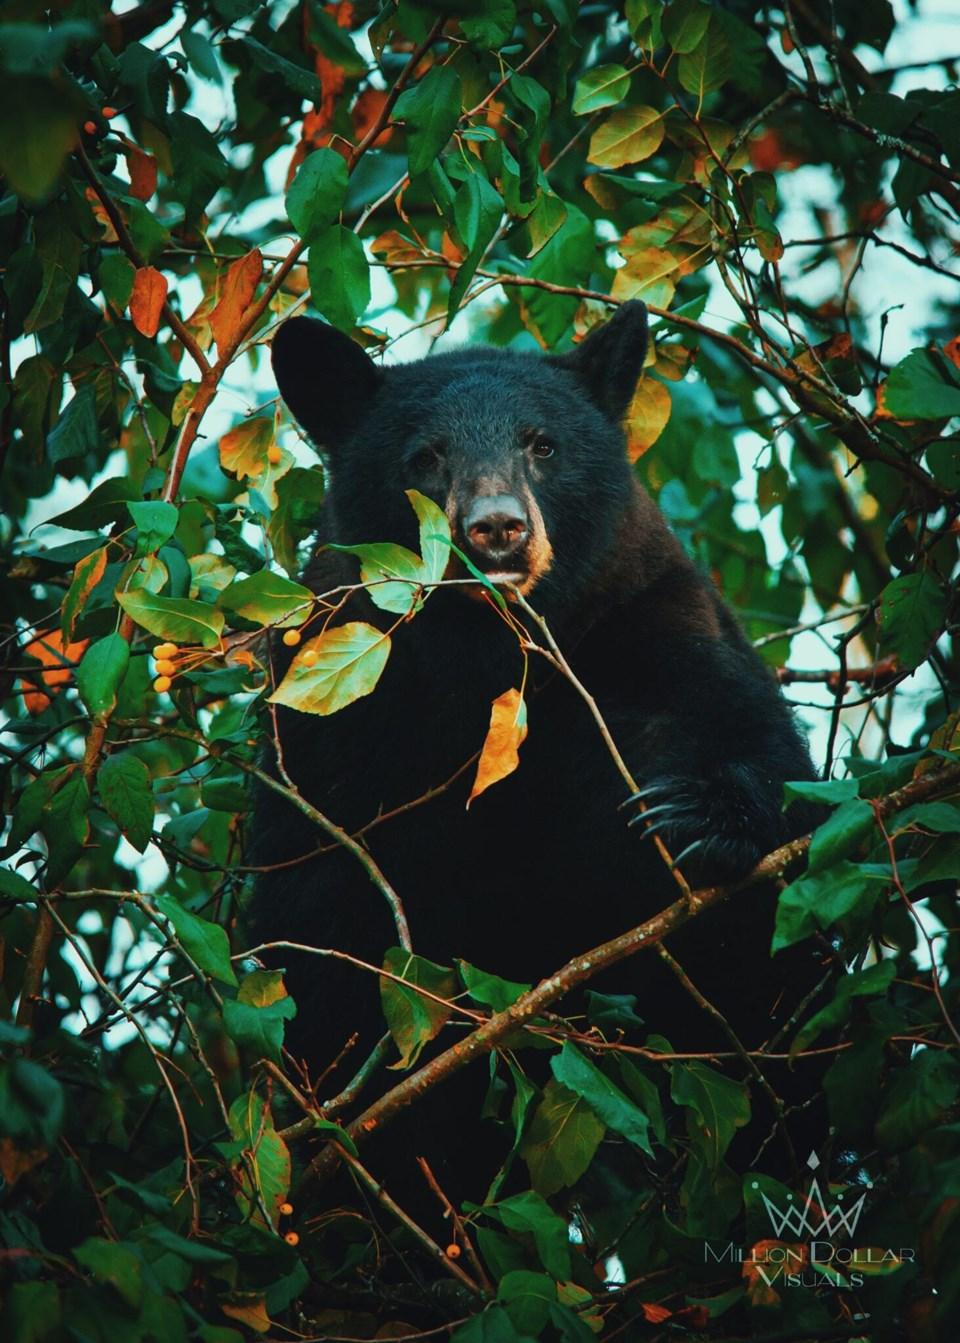 Bear eating berries Britt Sandberg photo (2)